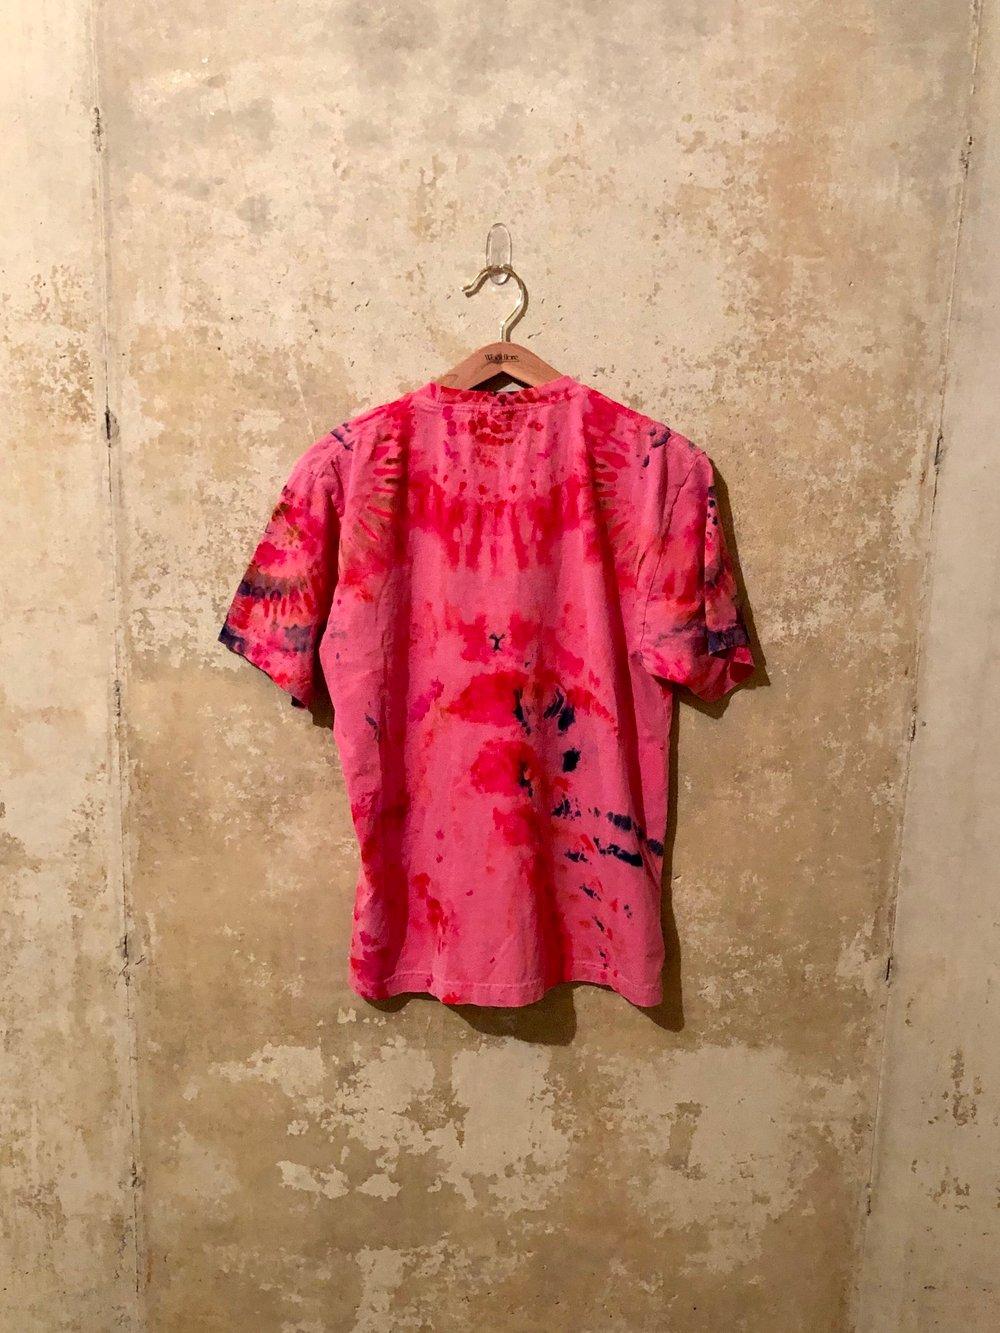 Small Puff Print Tye Dye Shirt #9